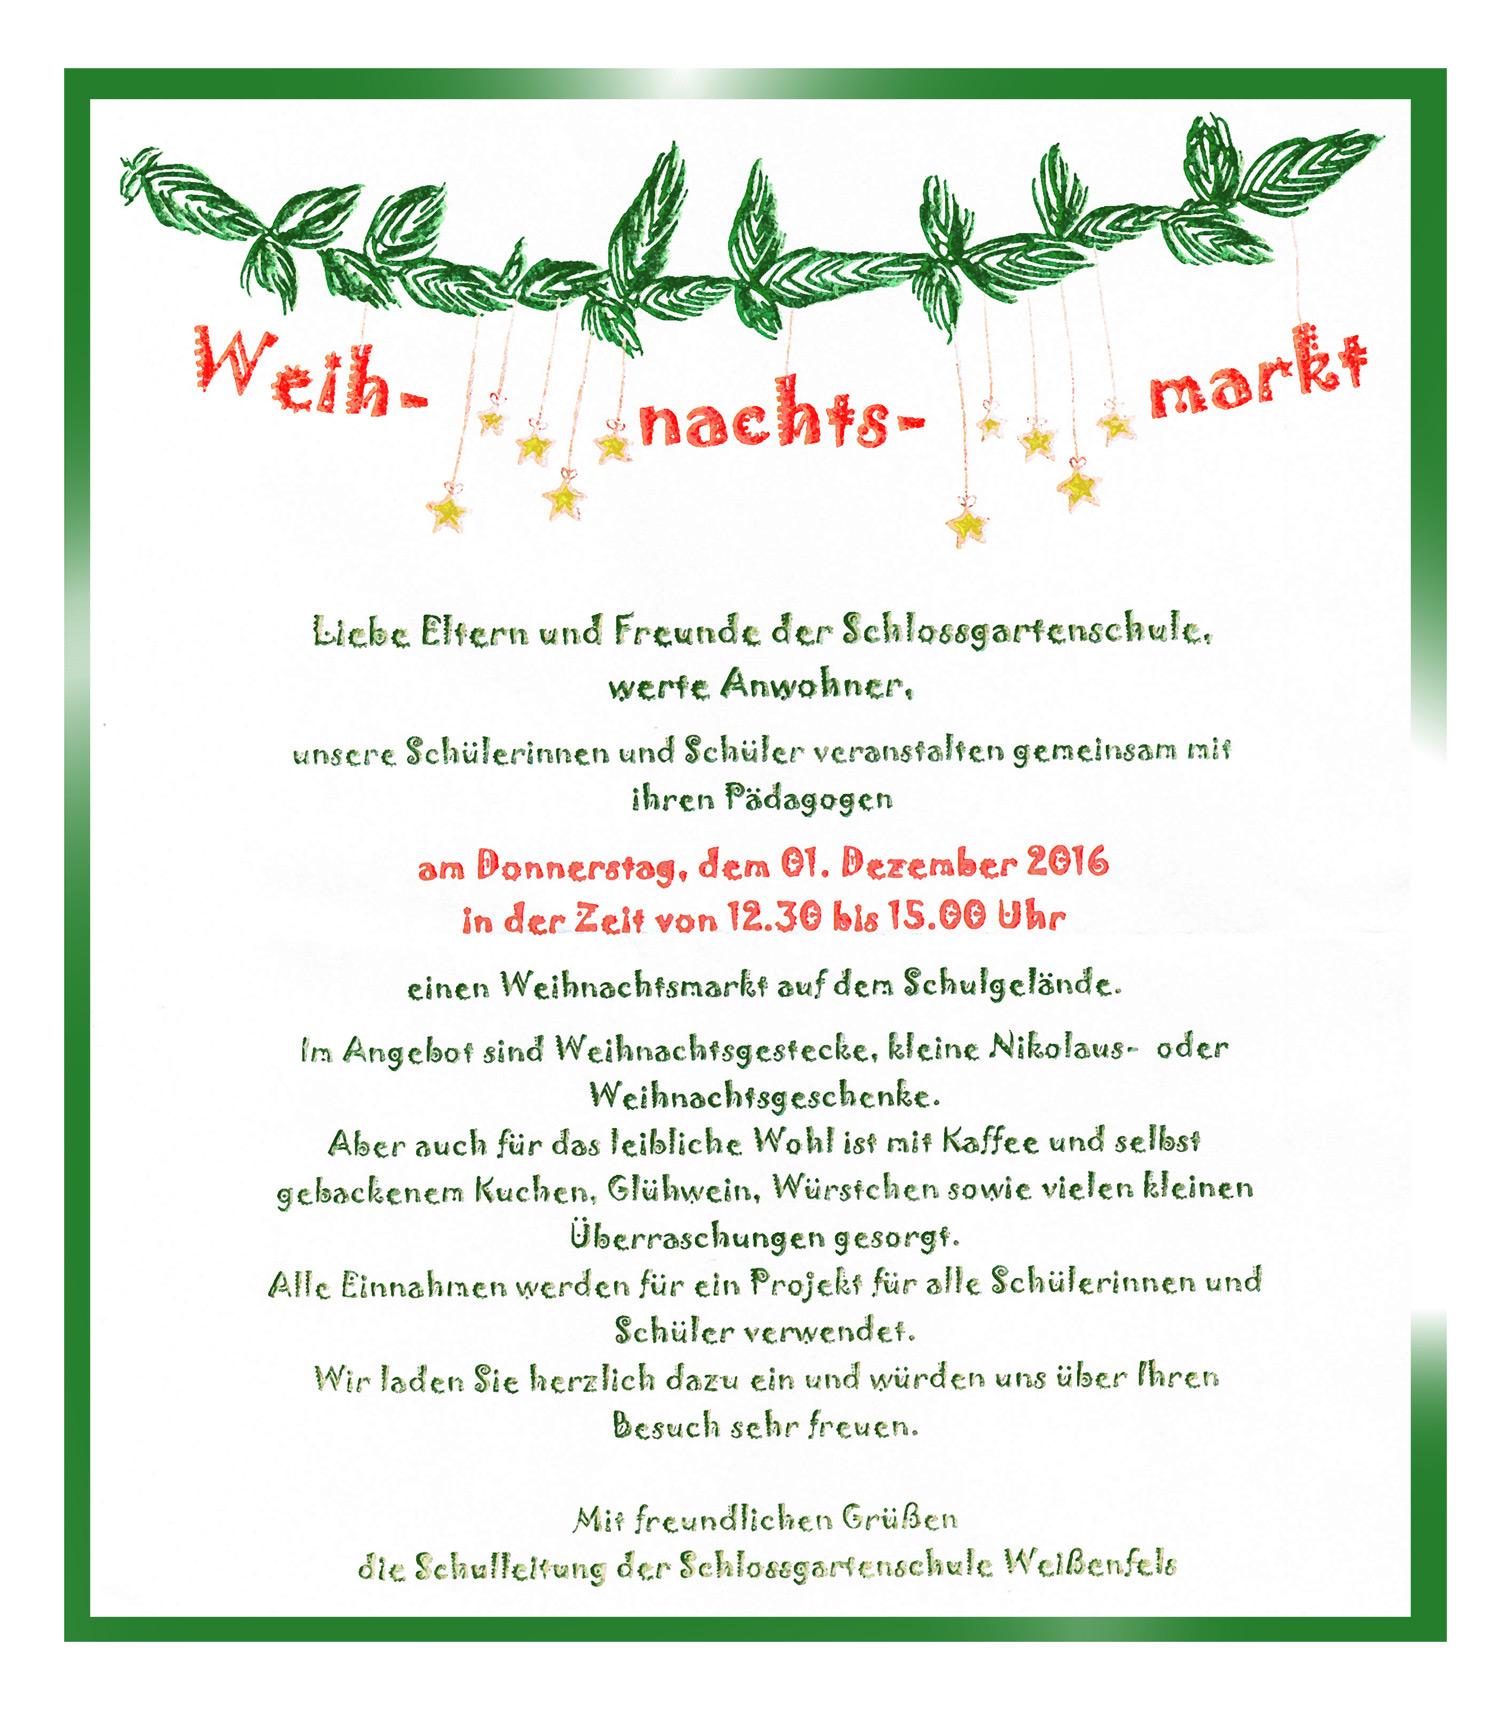 weihnachtsmarkt – schlossgartenschule_wsf.de, Einladungen